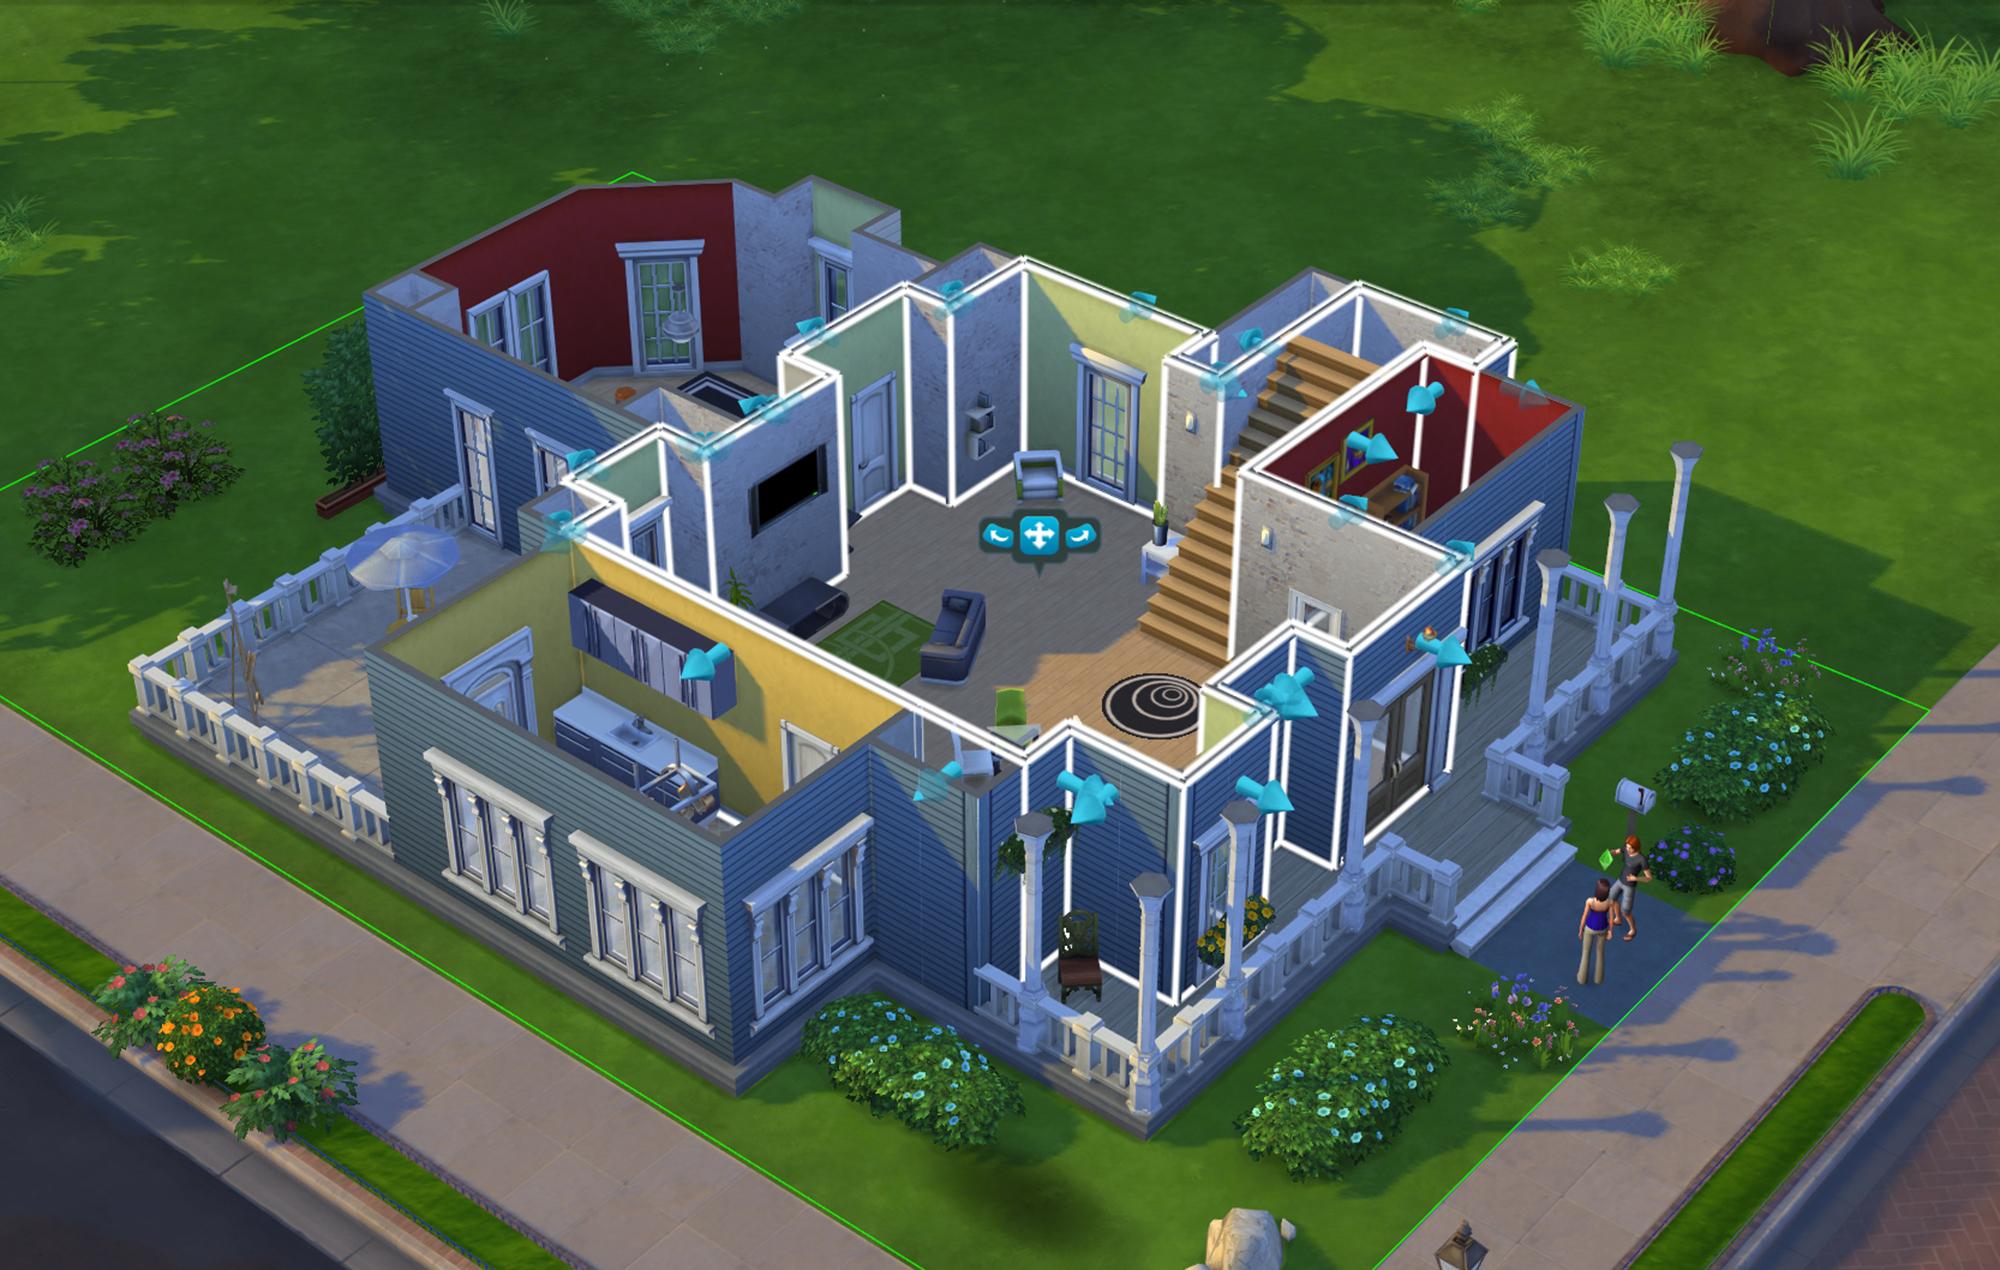 Sims 4 home